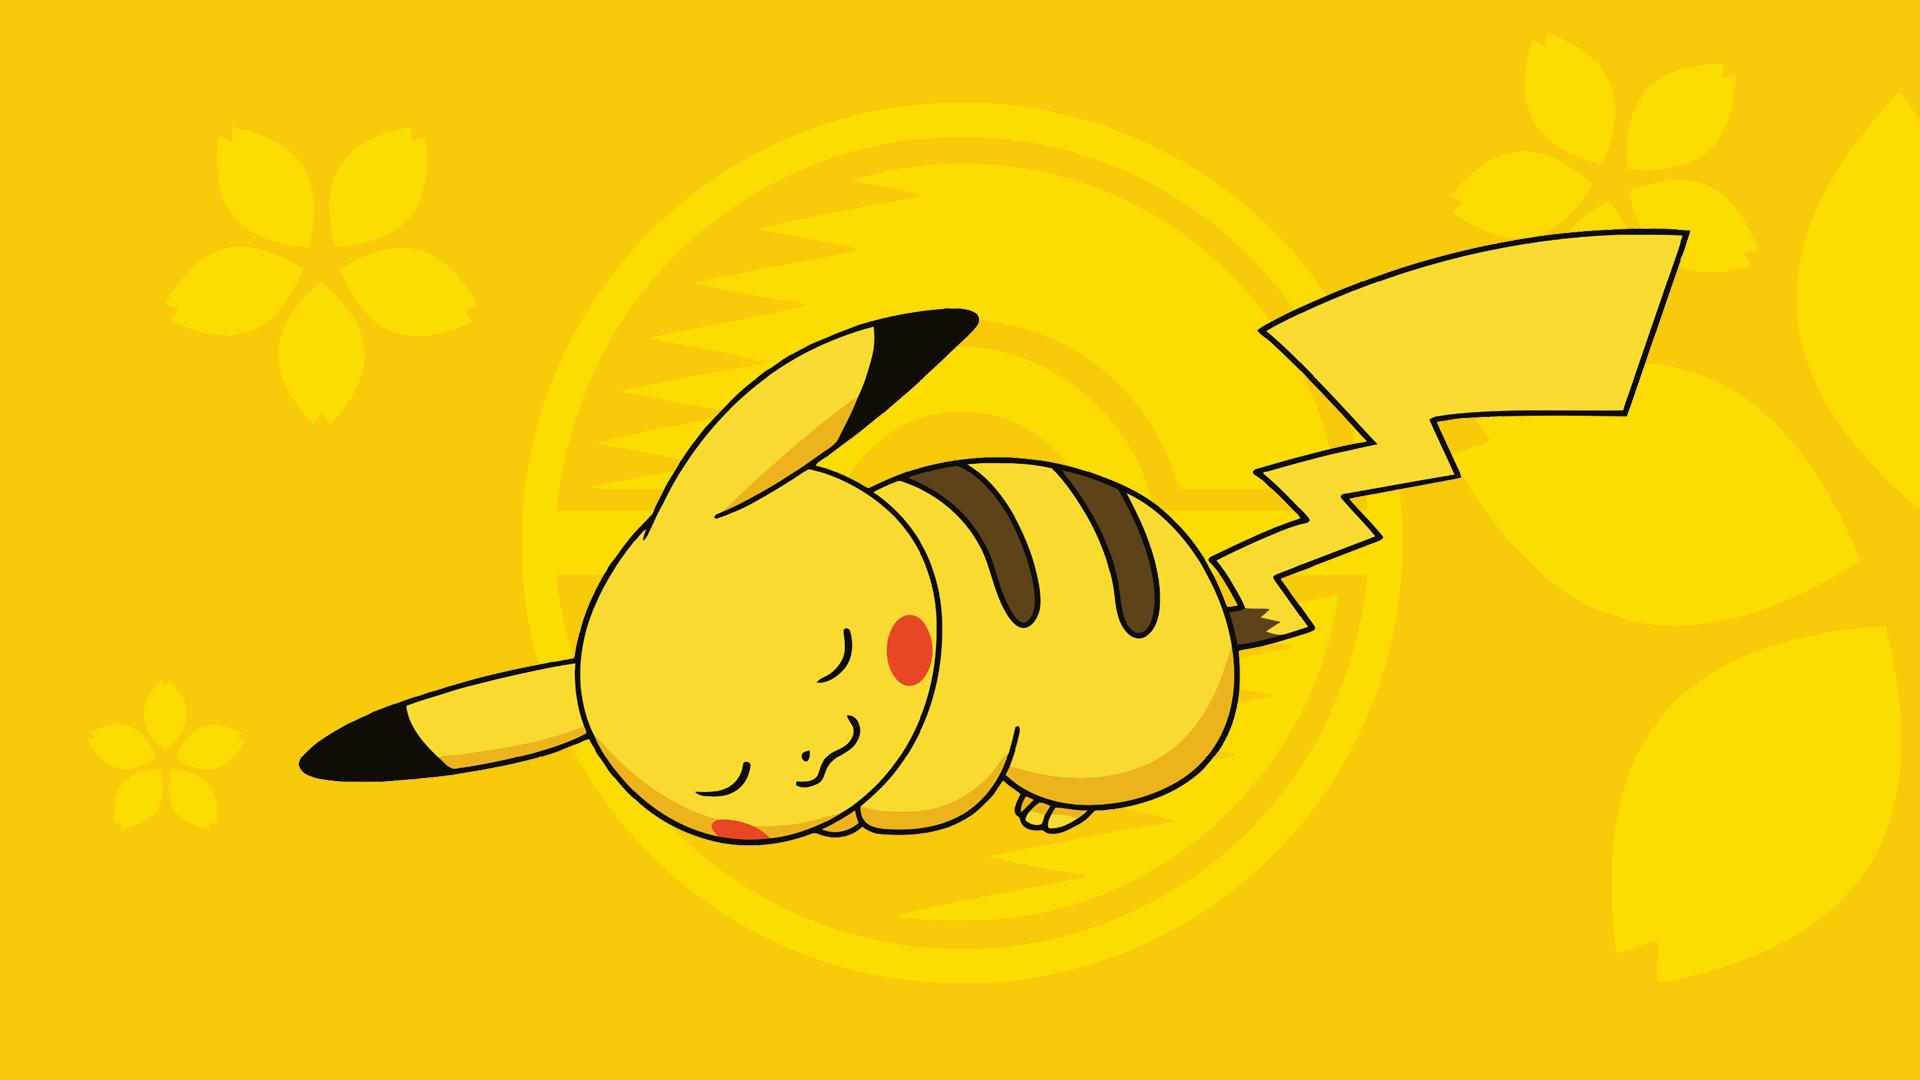 Wallpaper Onemuri Pikachu by Honokawa 1920x1080